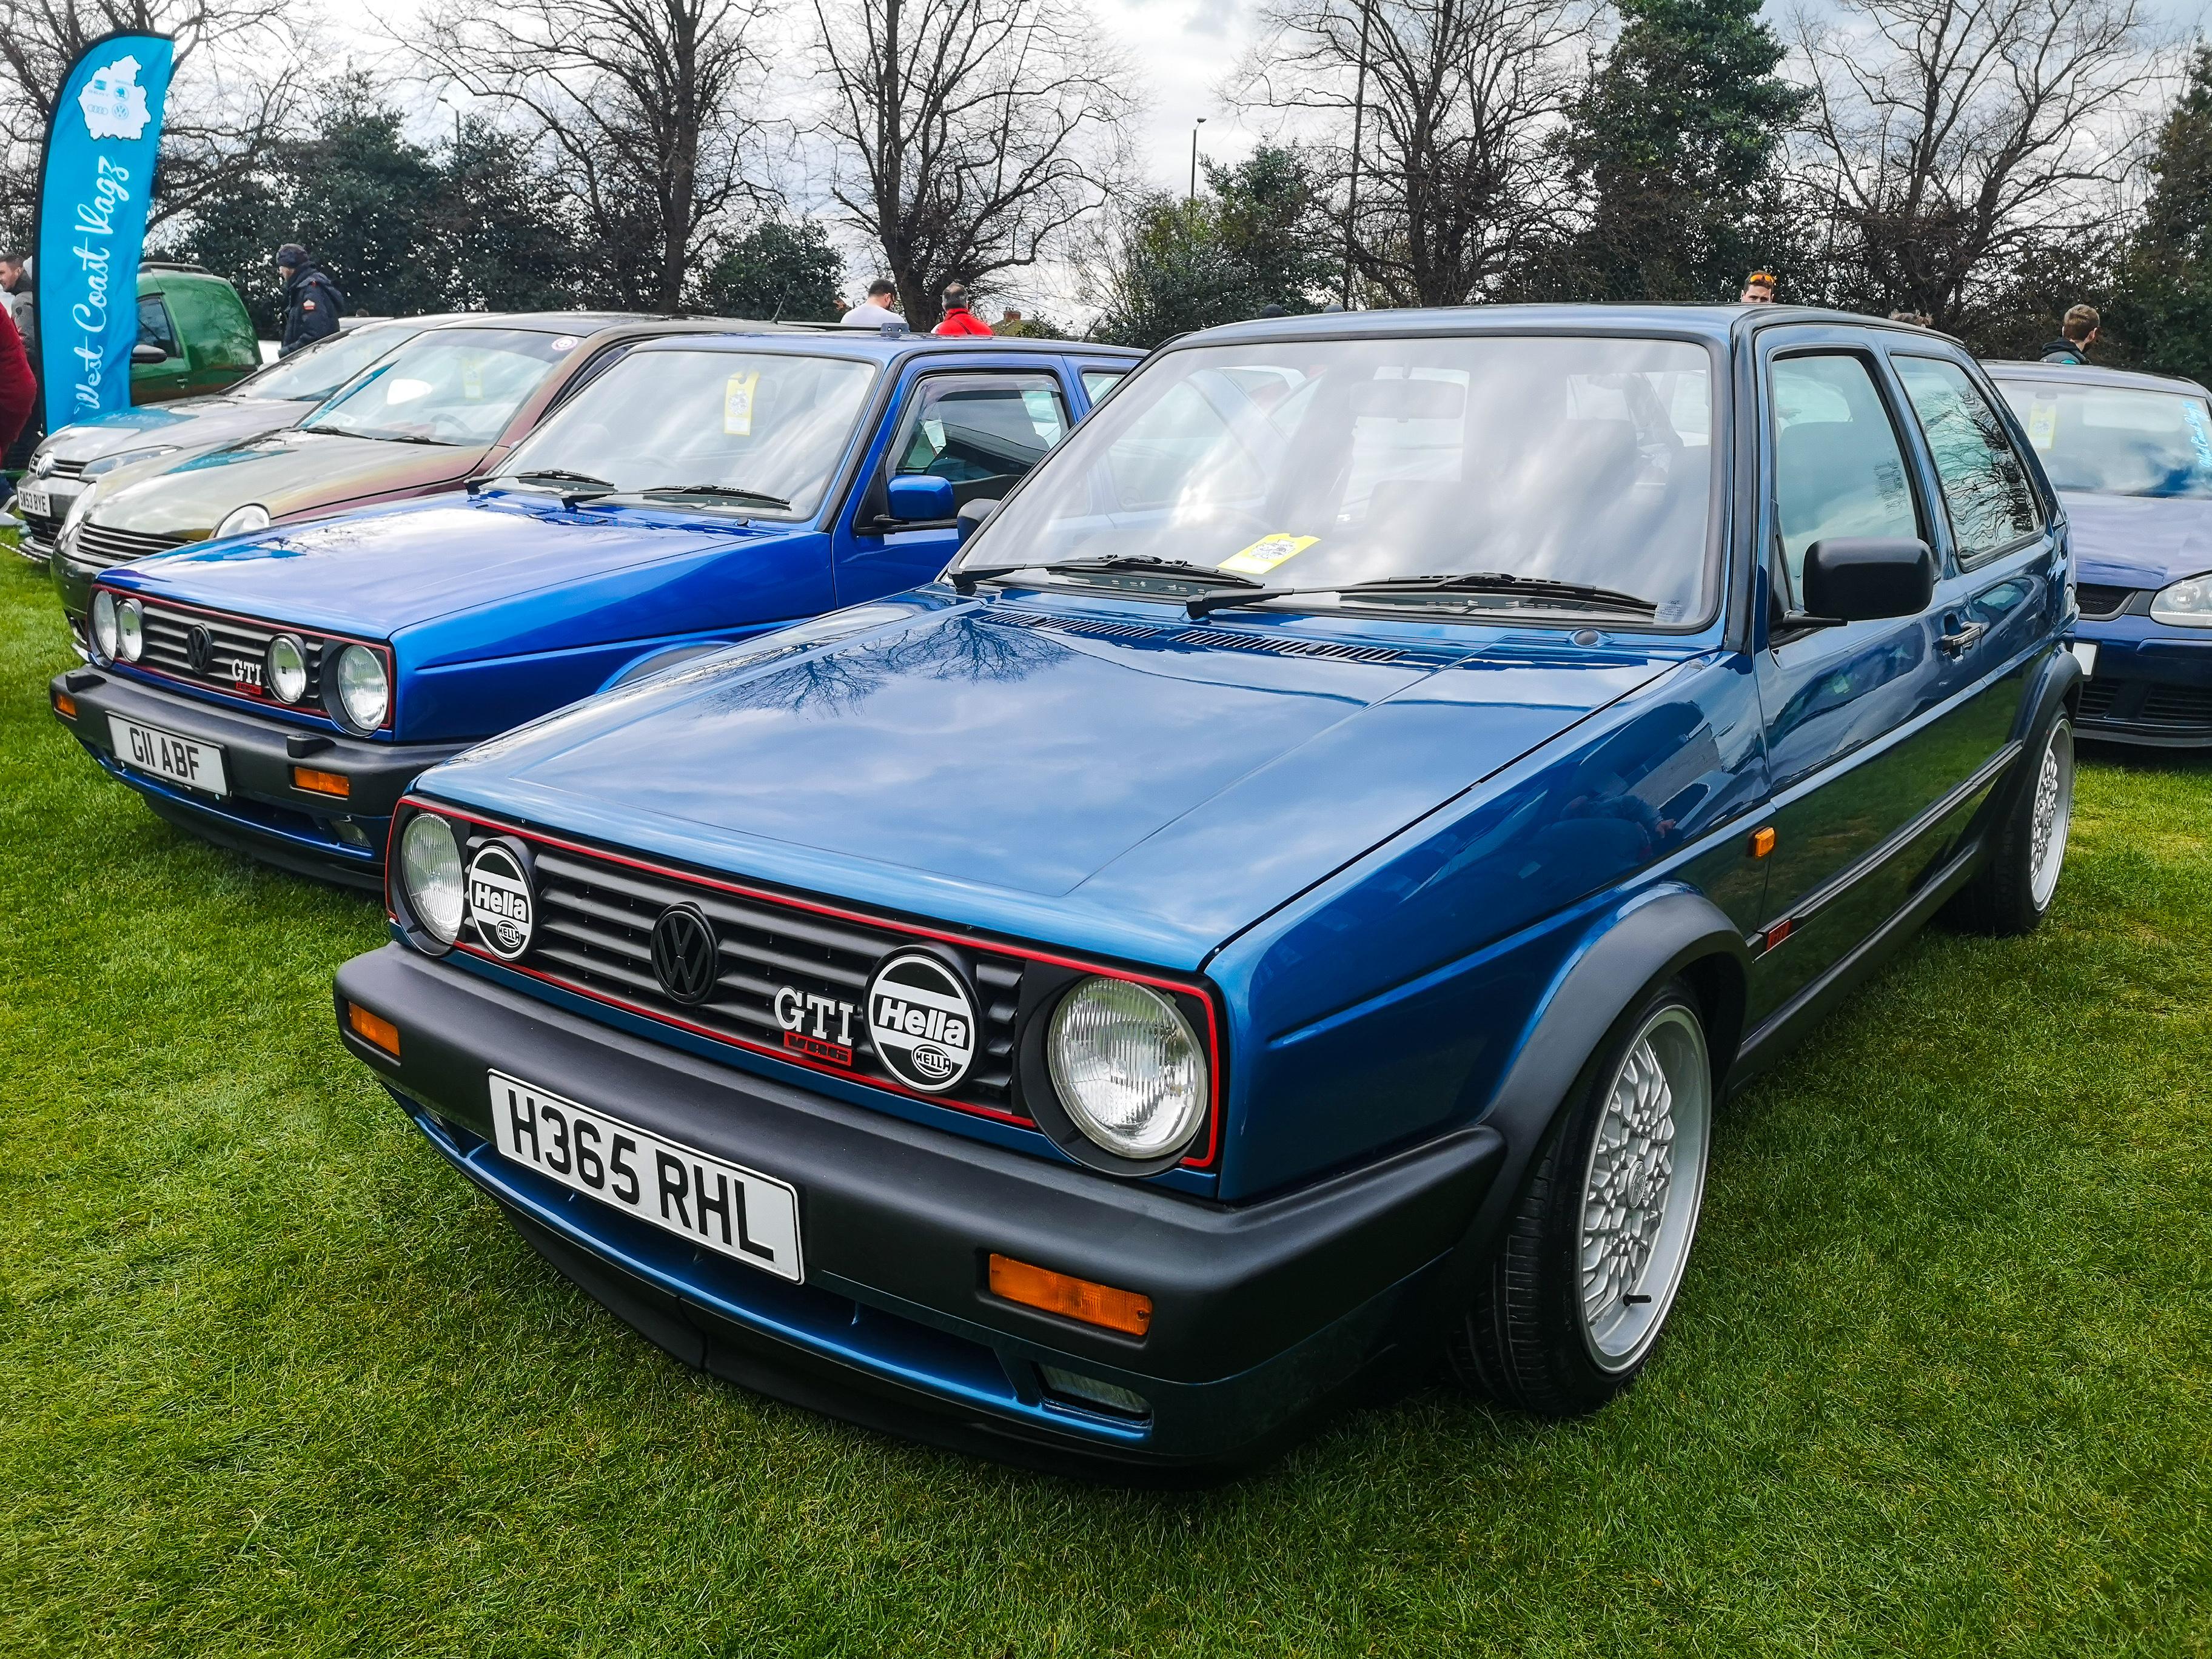 Bright Blue Metallic MK2 Golf